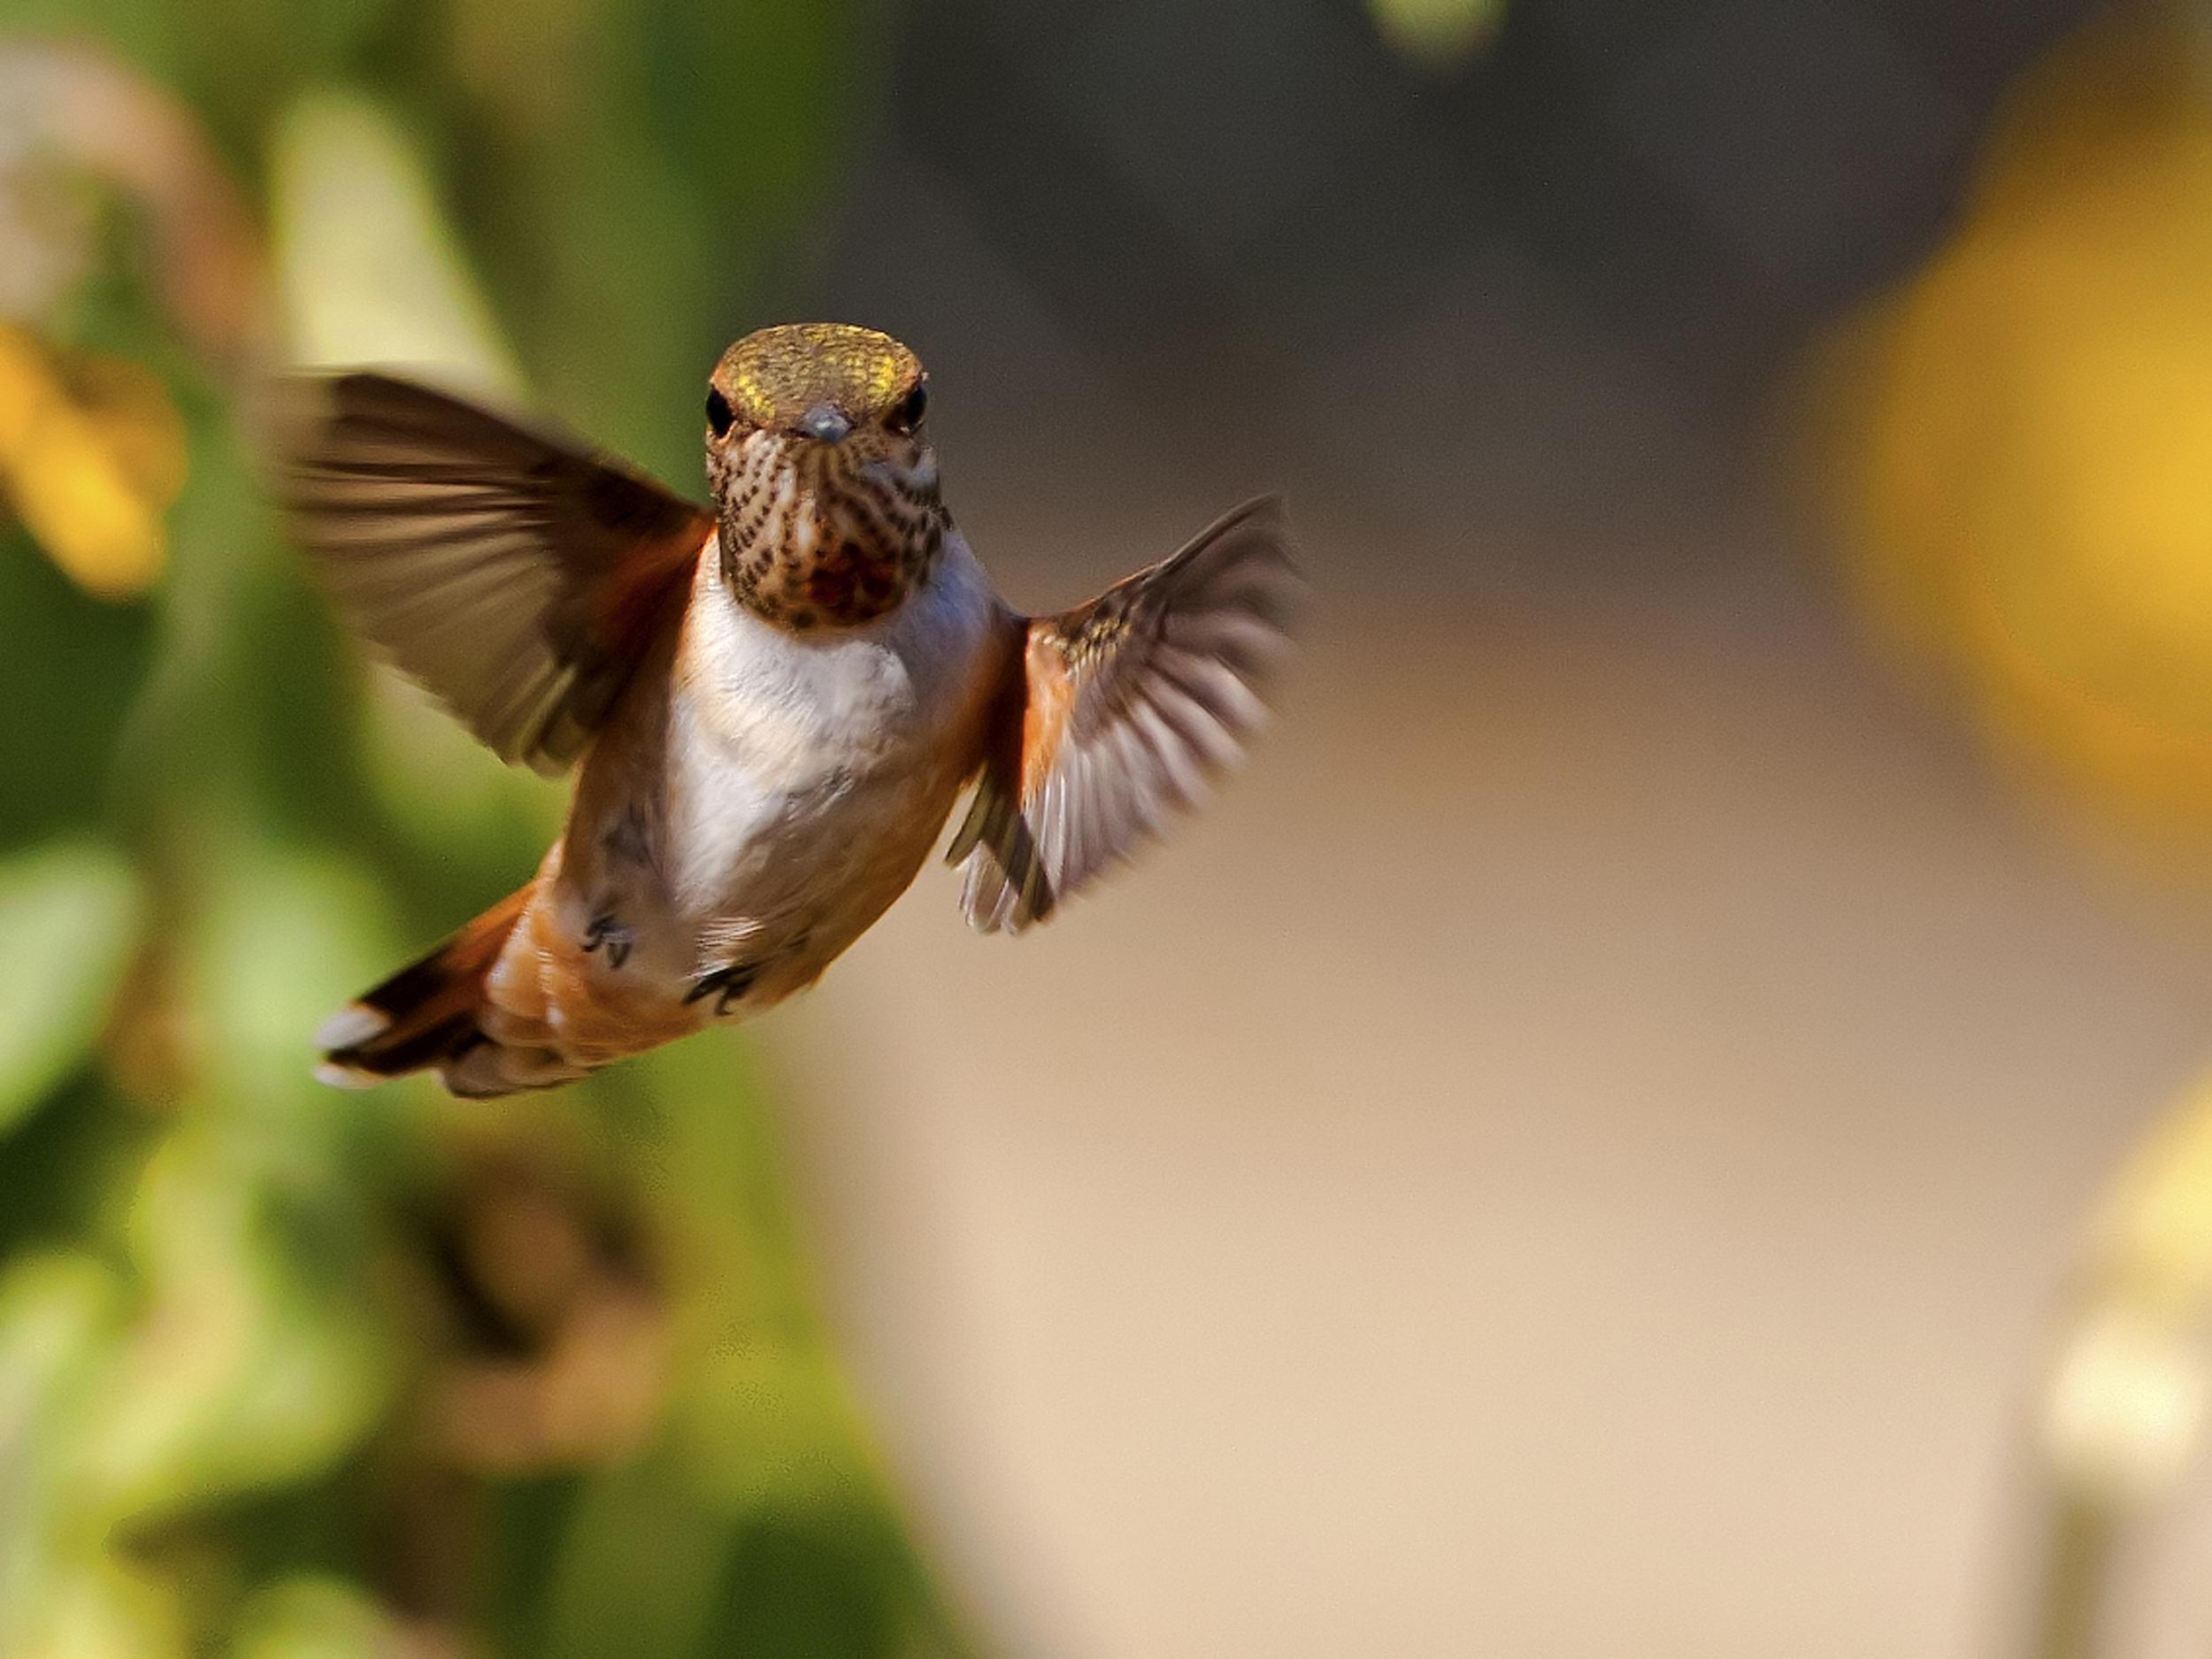 130 - Hummingbird